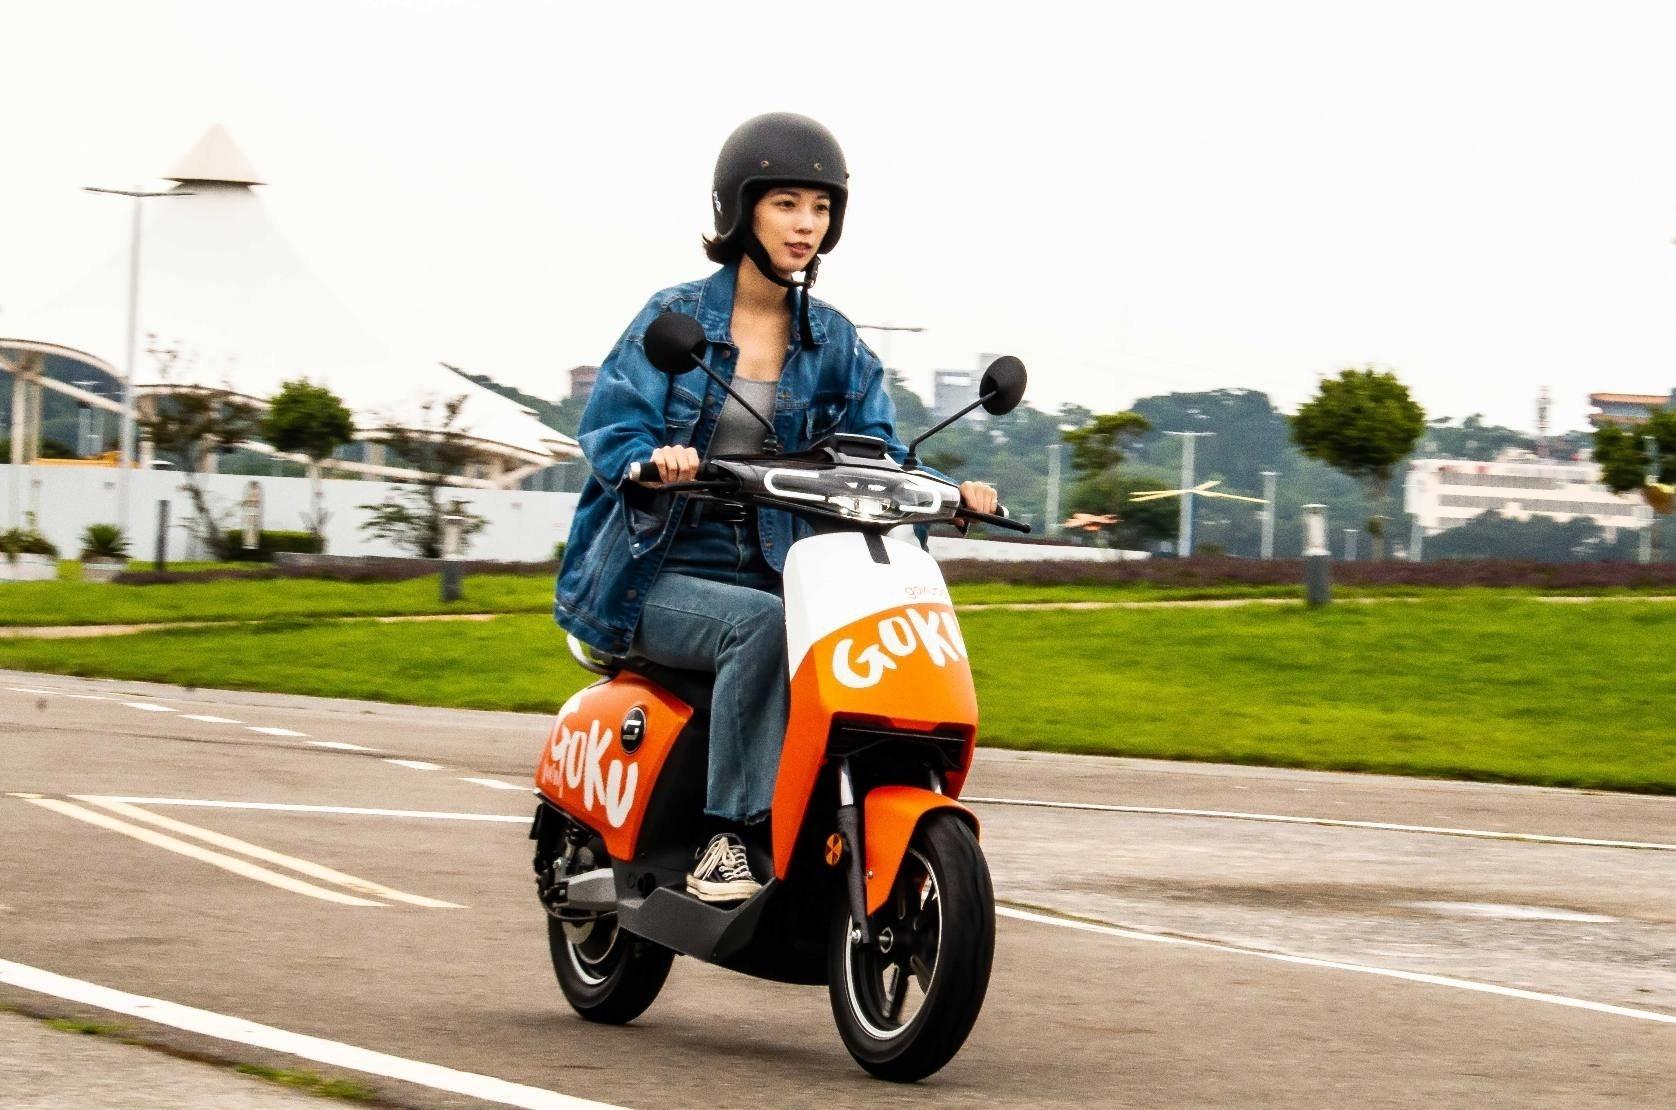 Car, Vespa, Wheel, Motor vehicle, Vehicle, Pound, car, scooter, motor vehicle, car, motorcycle, vehicle, motorcycling, vespa, product, wheel